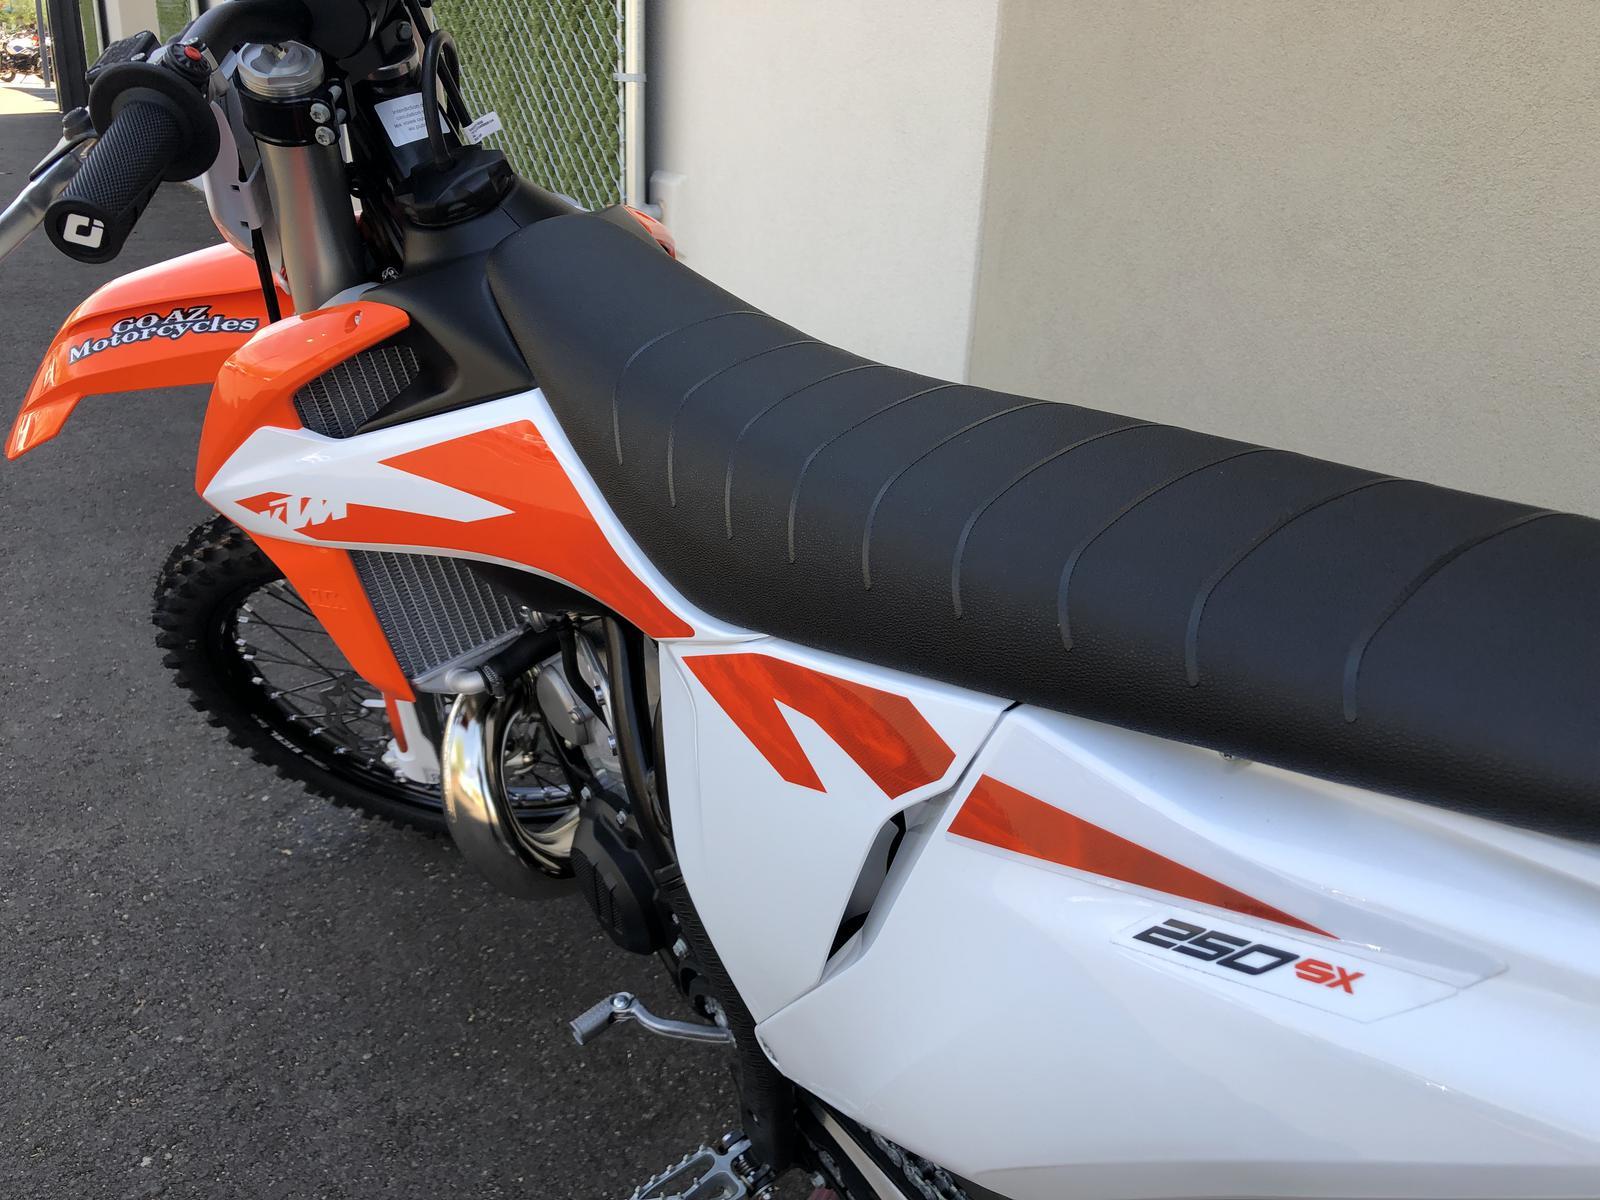 2020 KTM 250 SX